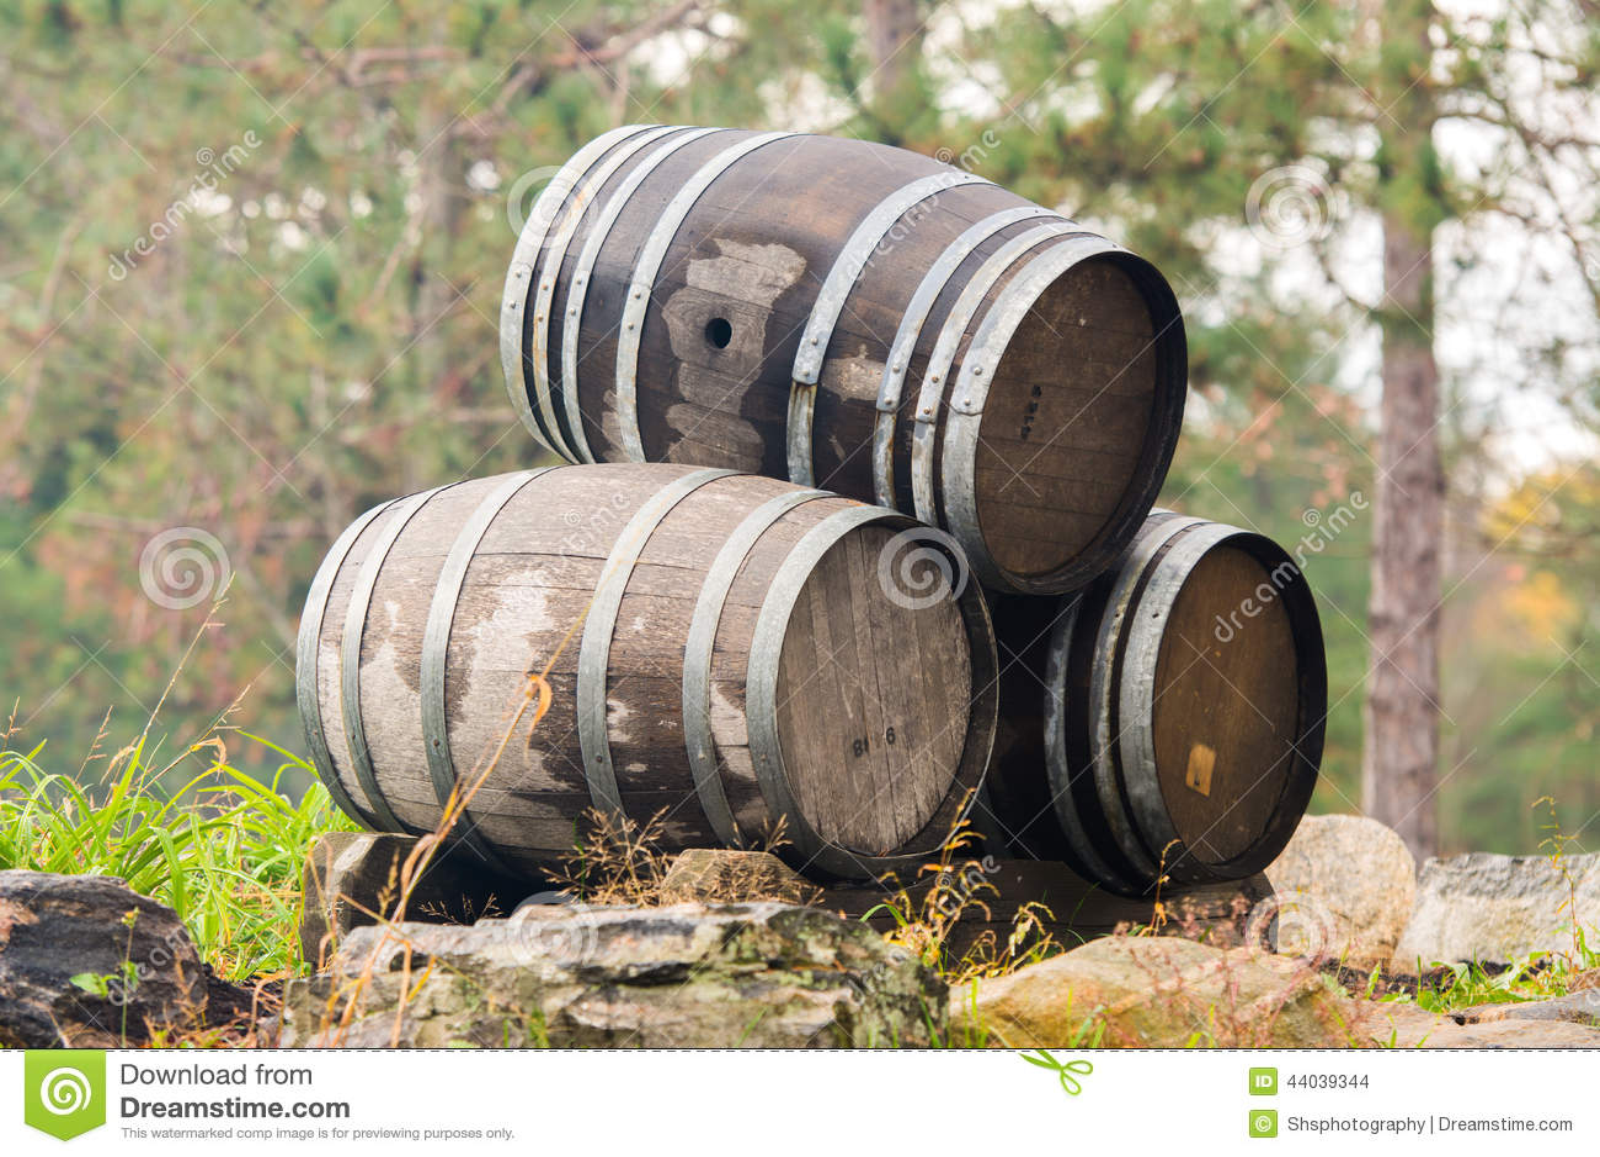 stack wine barrels three stacked wine barrels barrel office barrel middot